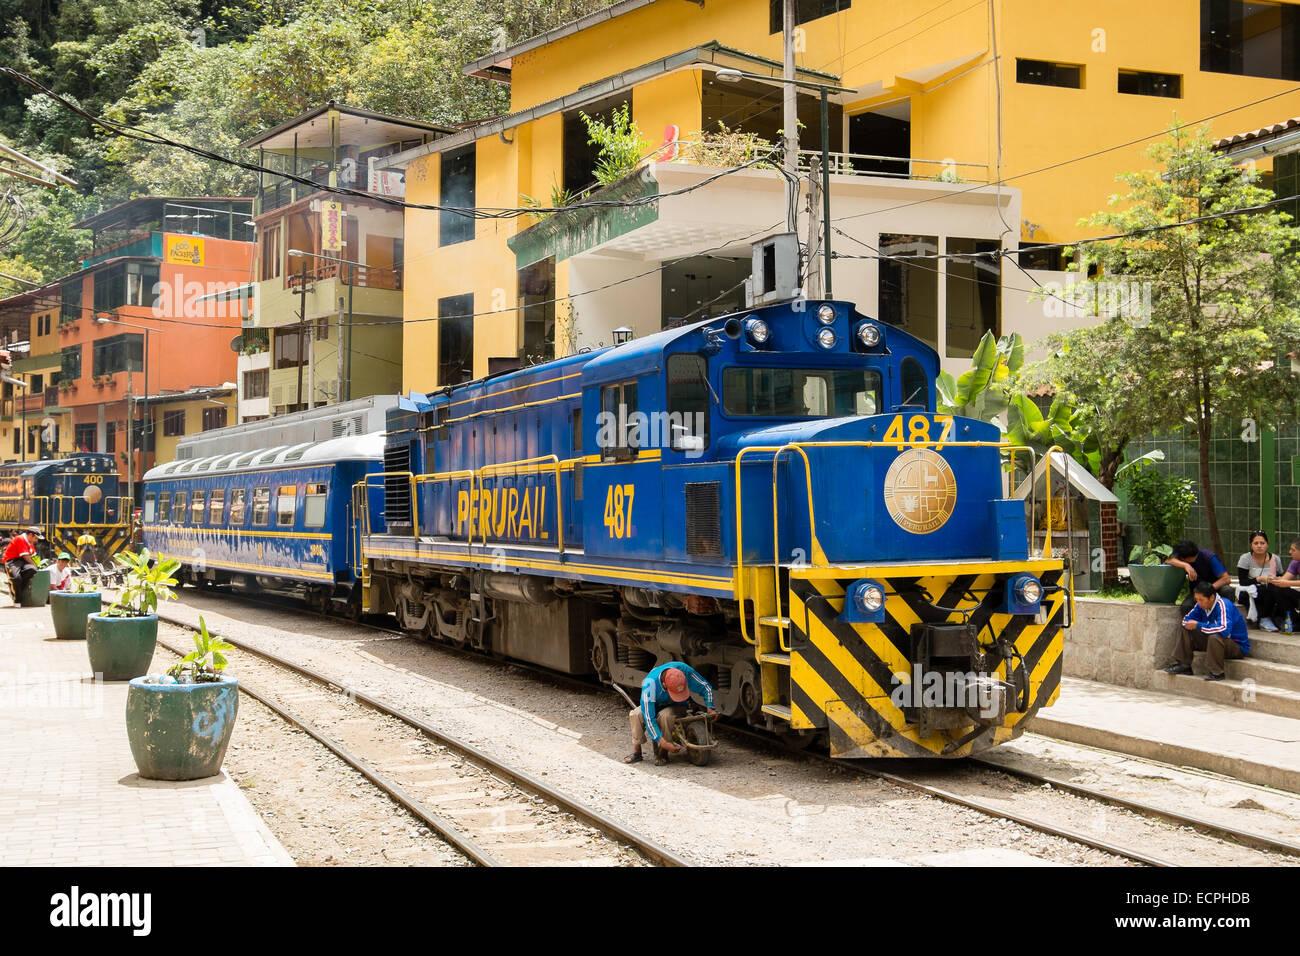 Blue Diesel Electric Perurail Locomotive and carriage at Aguas Calientes, near Cusco, Peru - Stock Image